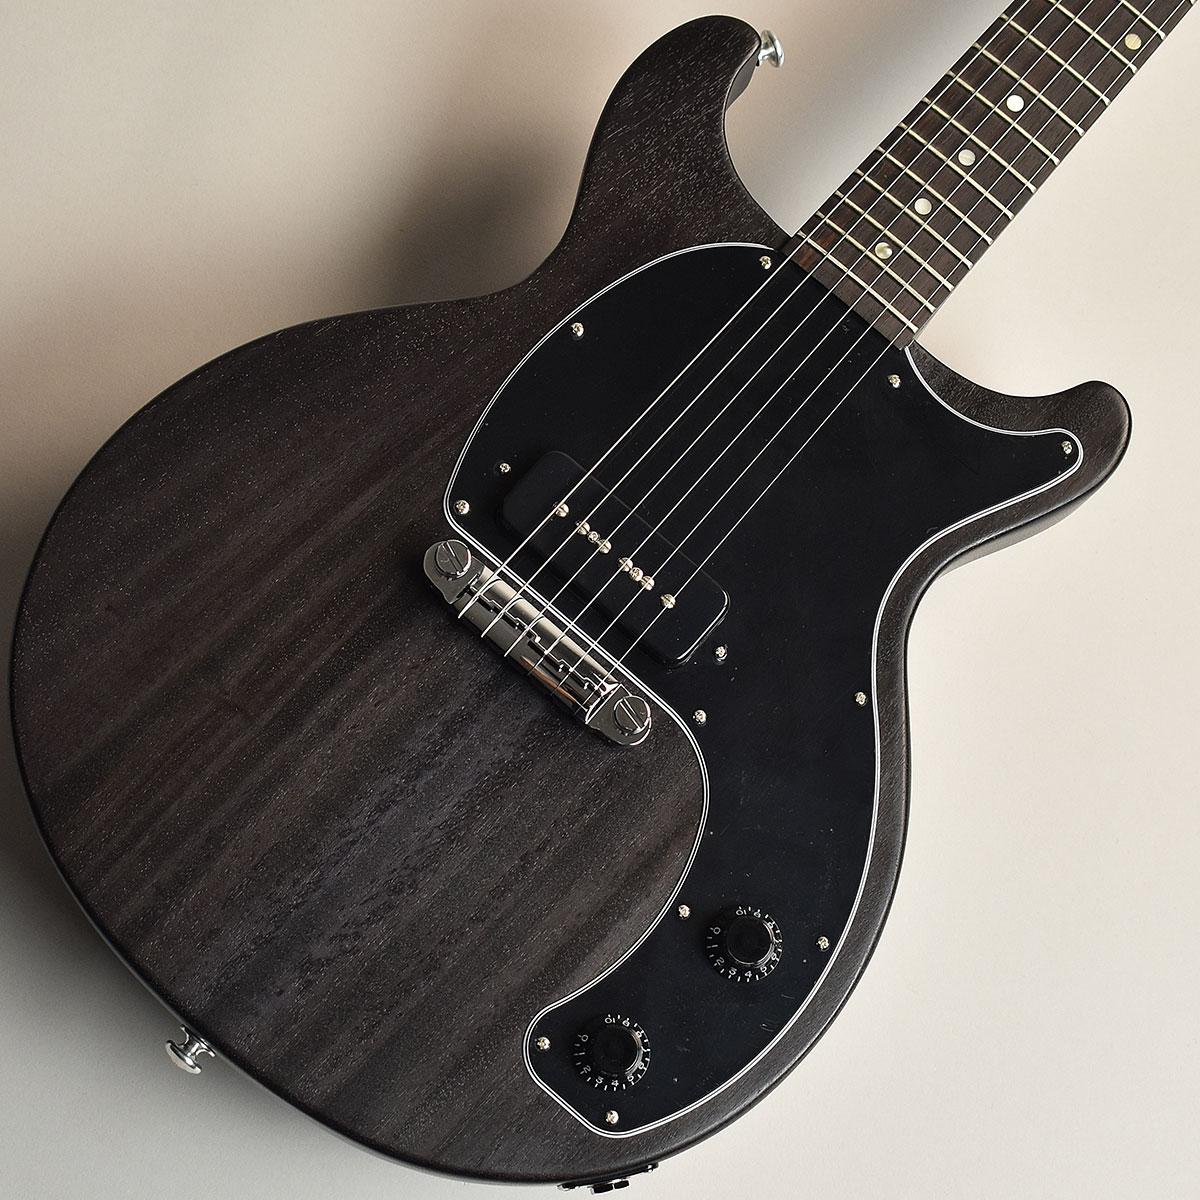 Gibson Les Paul Junior Tribute Double Cut Worn Ebony S/N:105390069 【ギブソン レスポールジュニア】【未展示品】